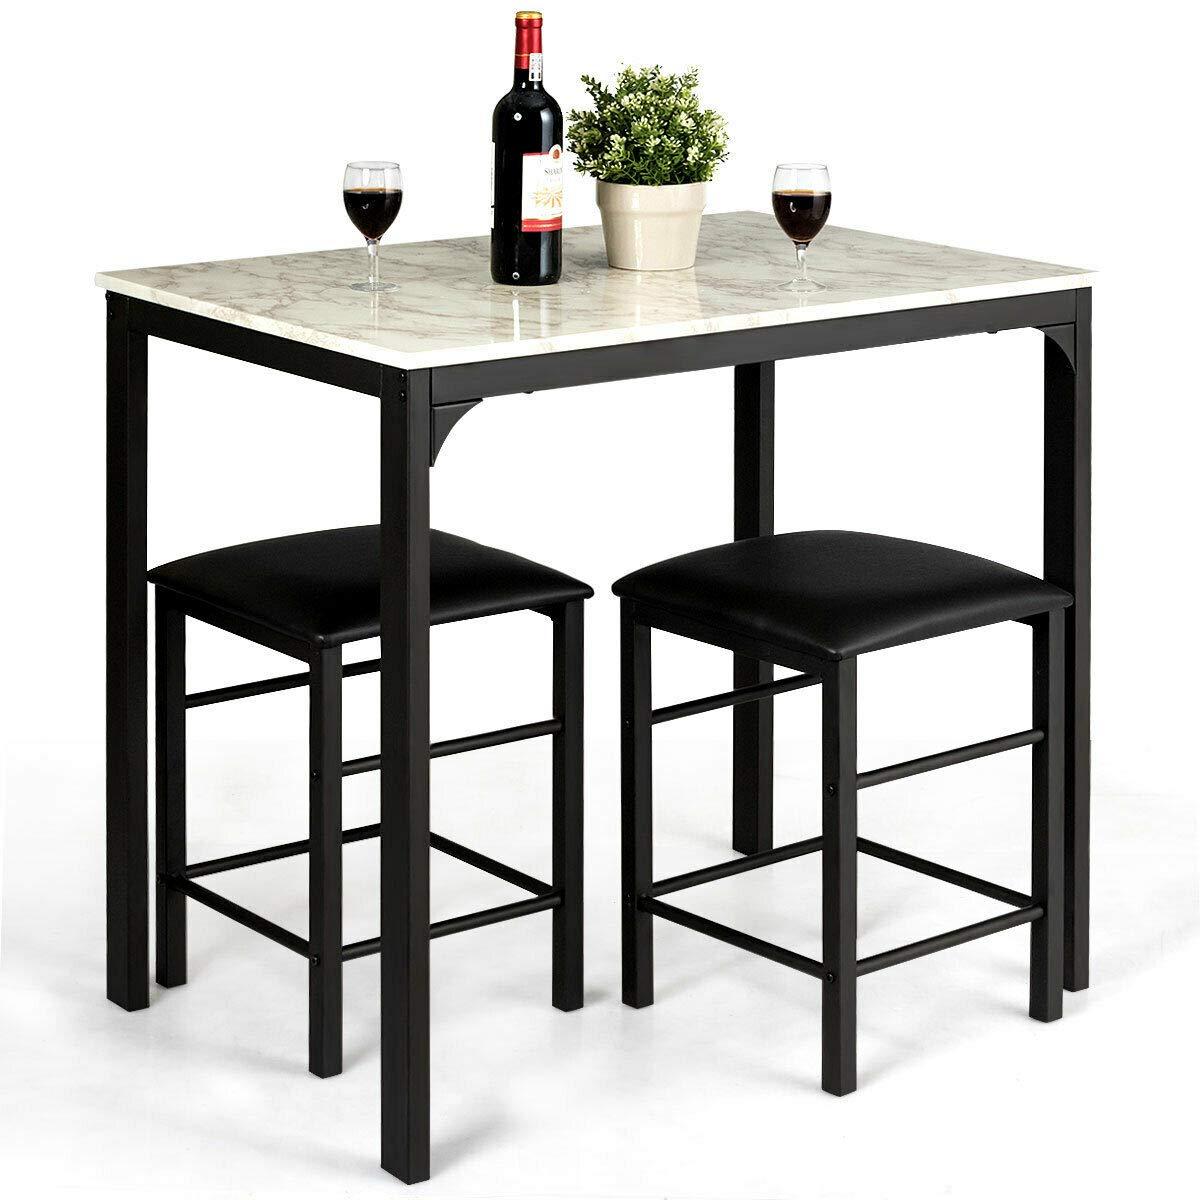 Miraculous Amazon Com N Bright Shop Faux Marble Table Top 3 Piece Machost Co Dining Chair Design Ideas Machostcouk